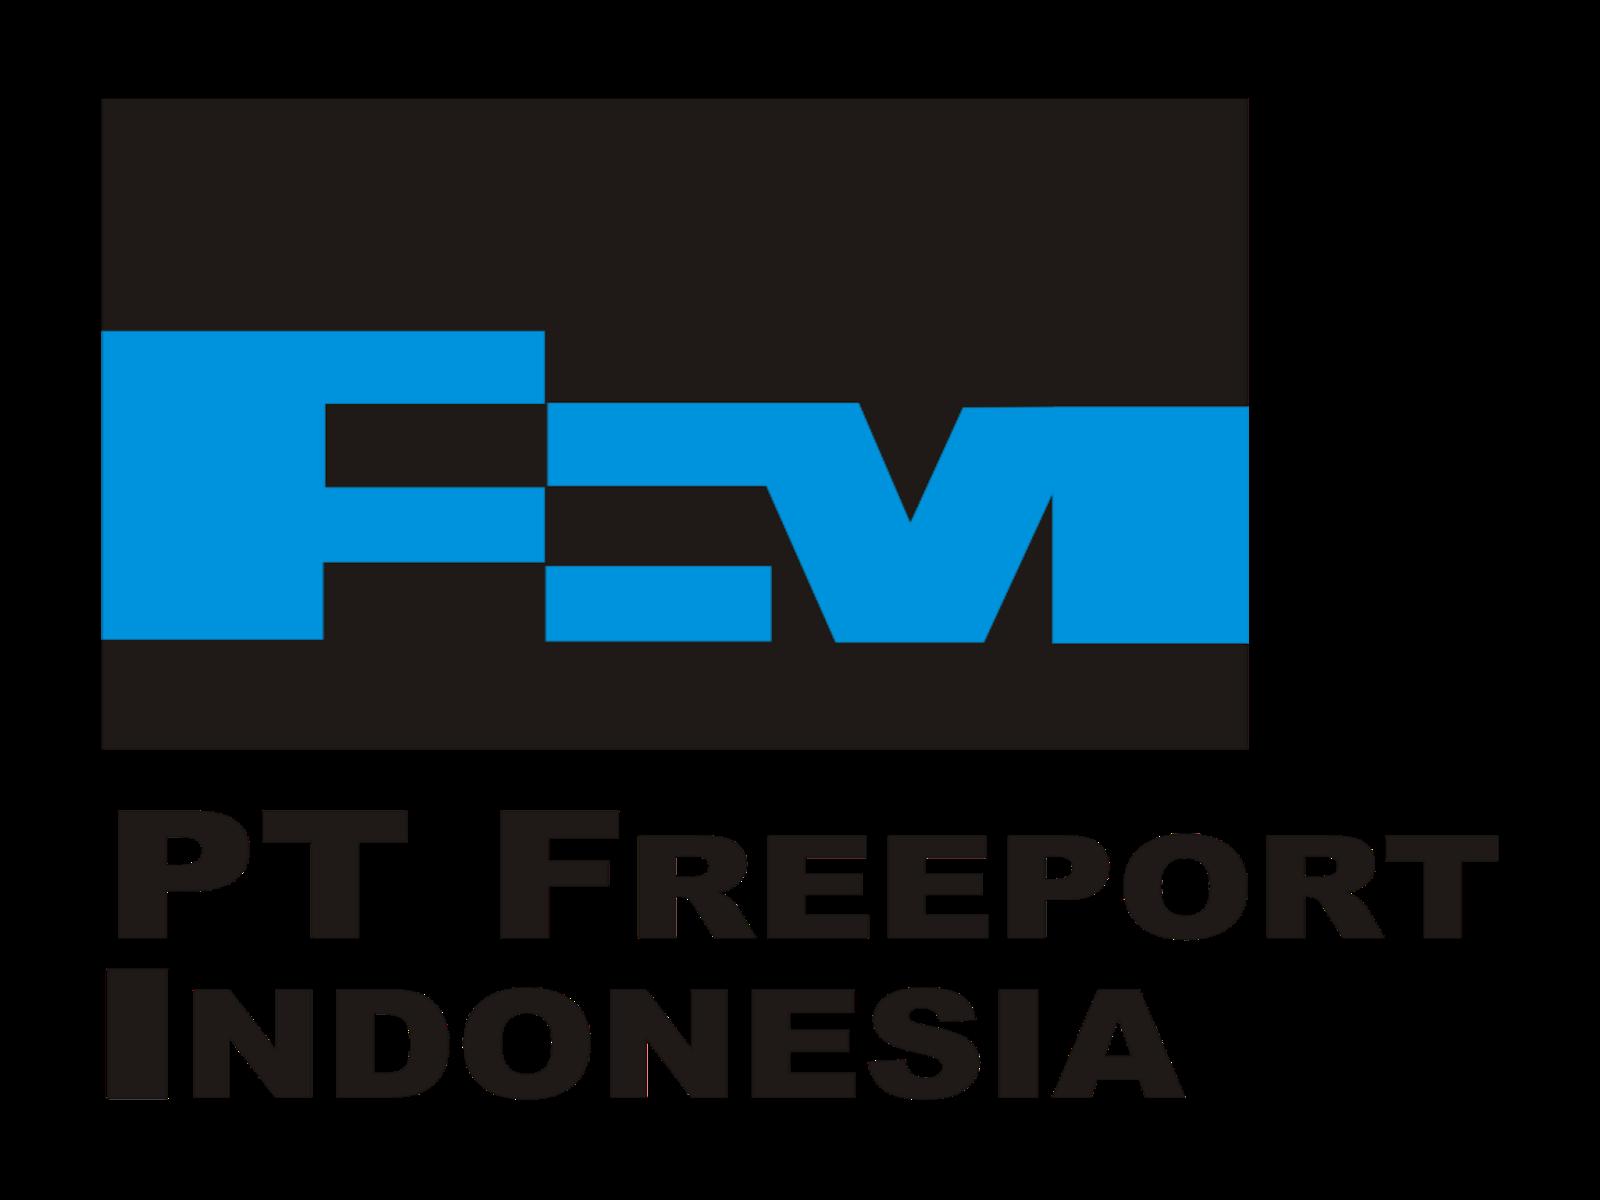 PT Freeport Indonesia